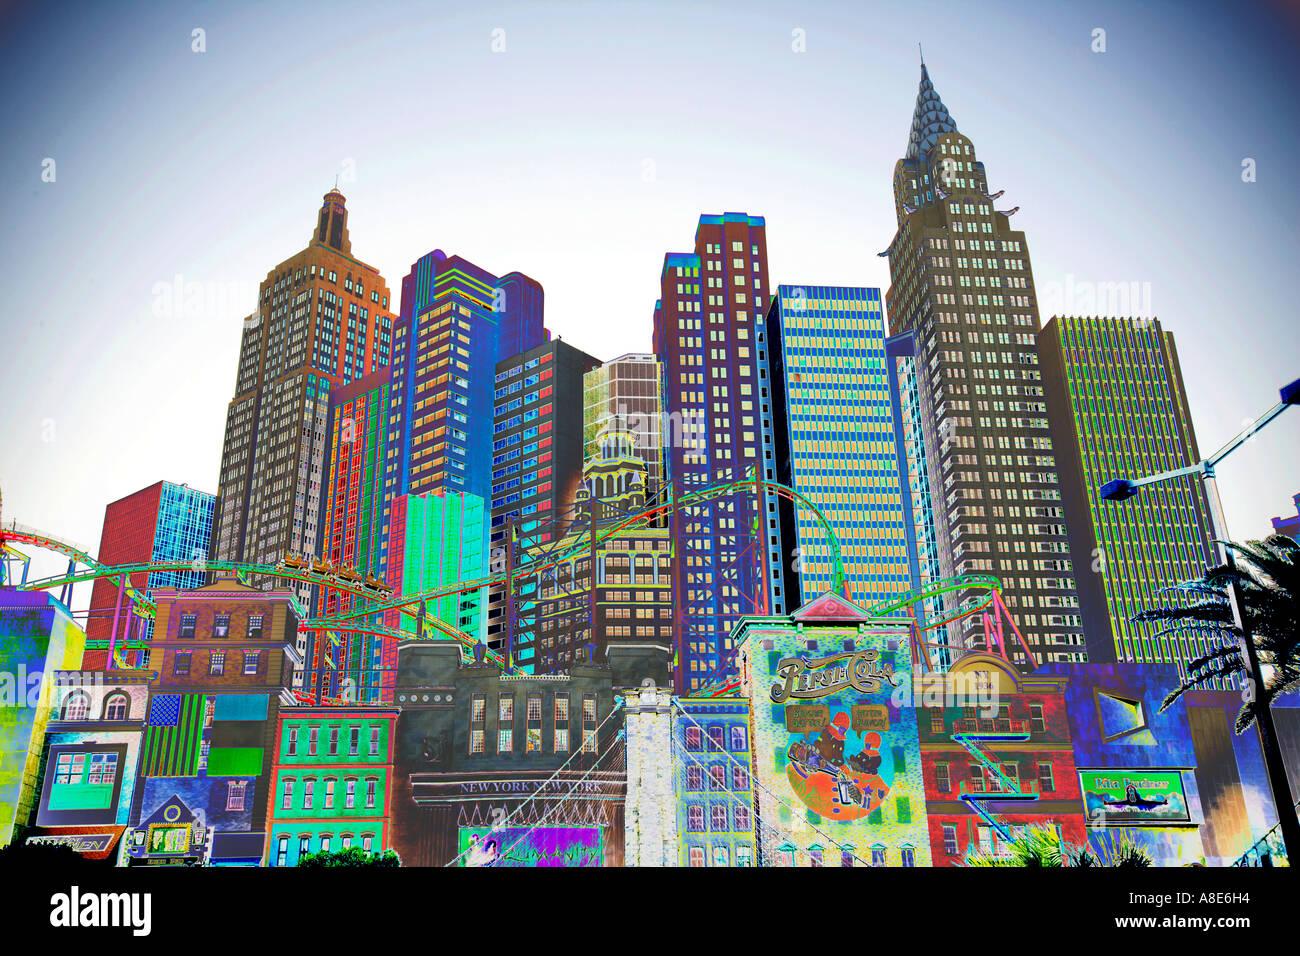 'New York New York' Complex, 'Las Vegas' - Stock Image